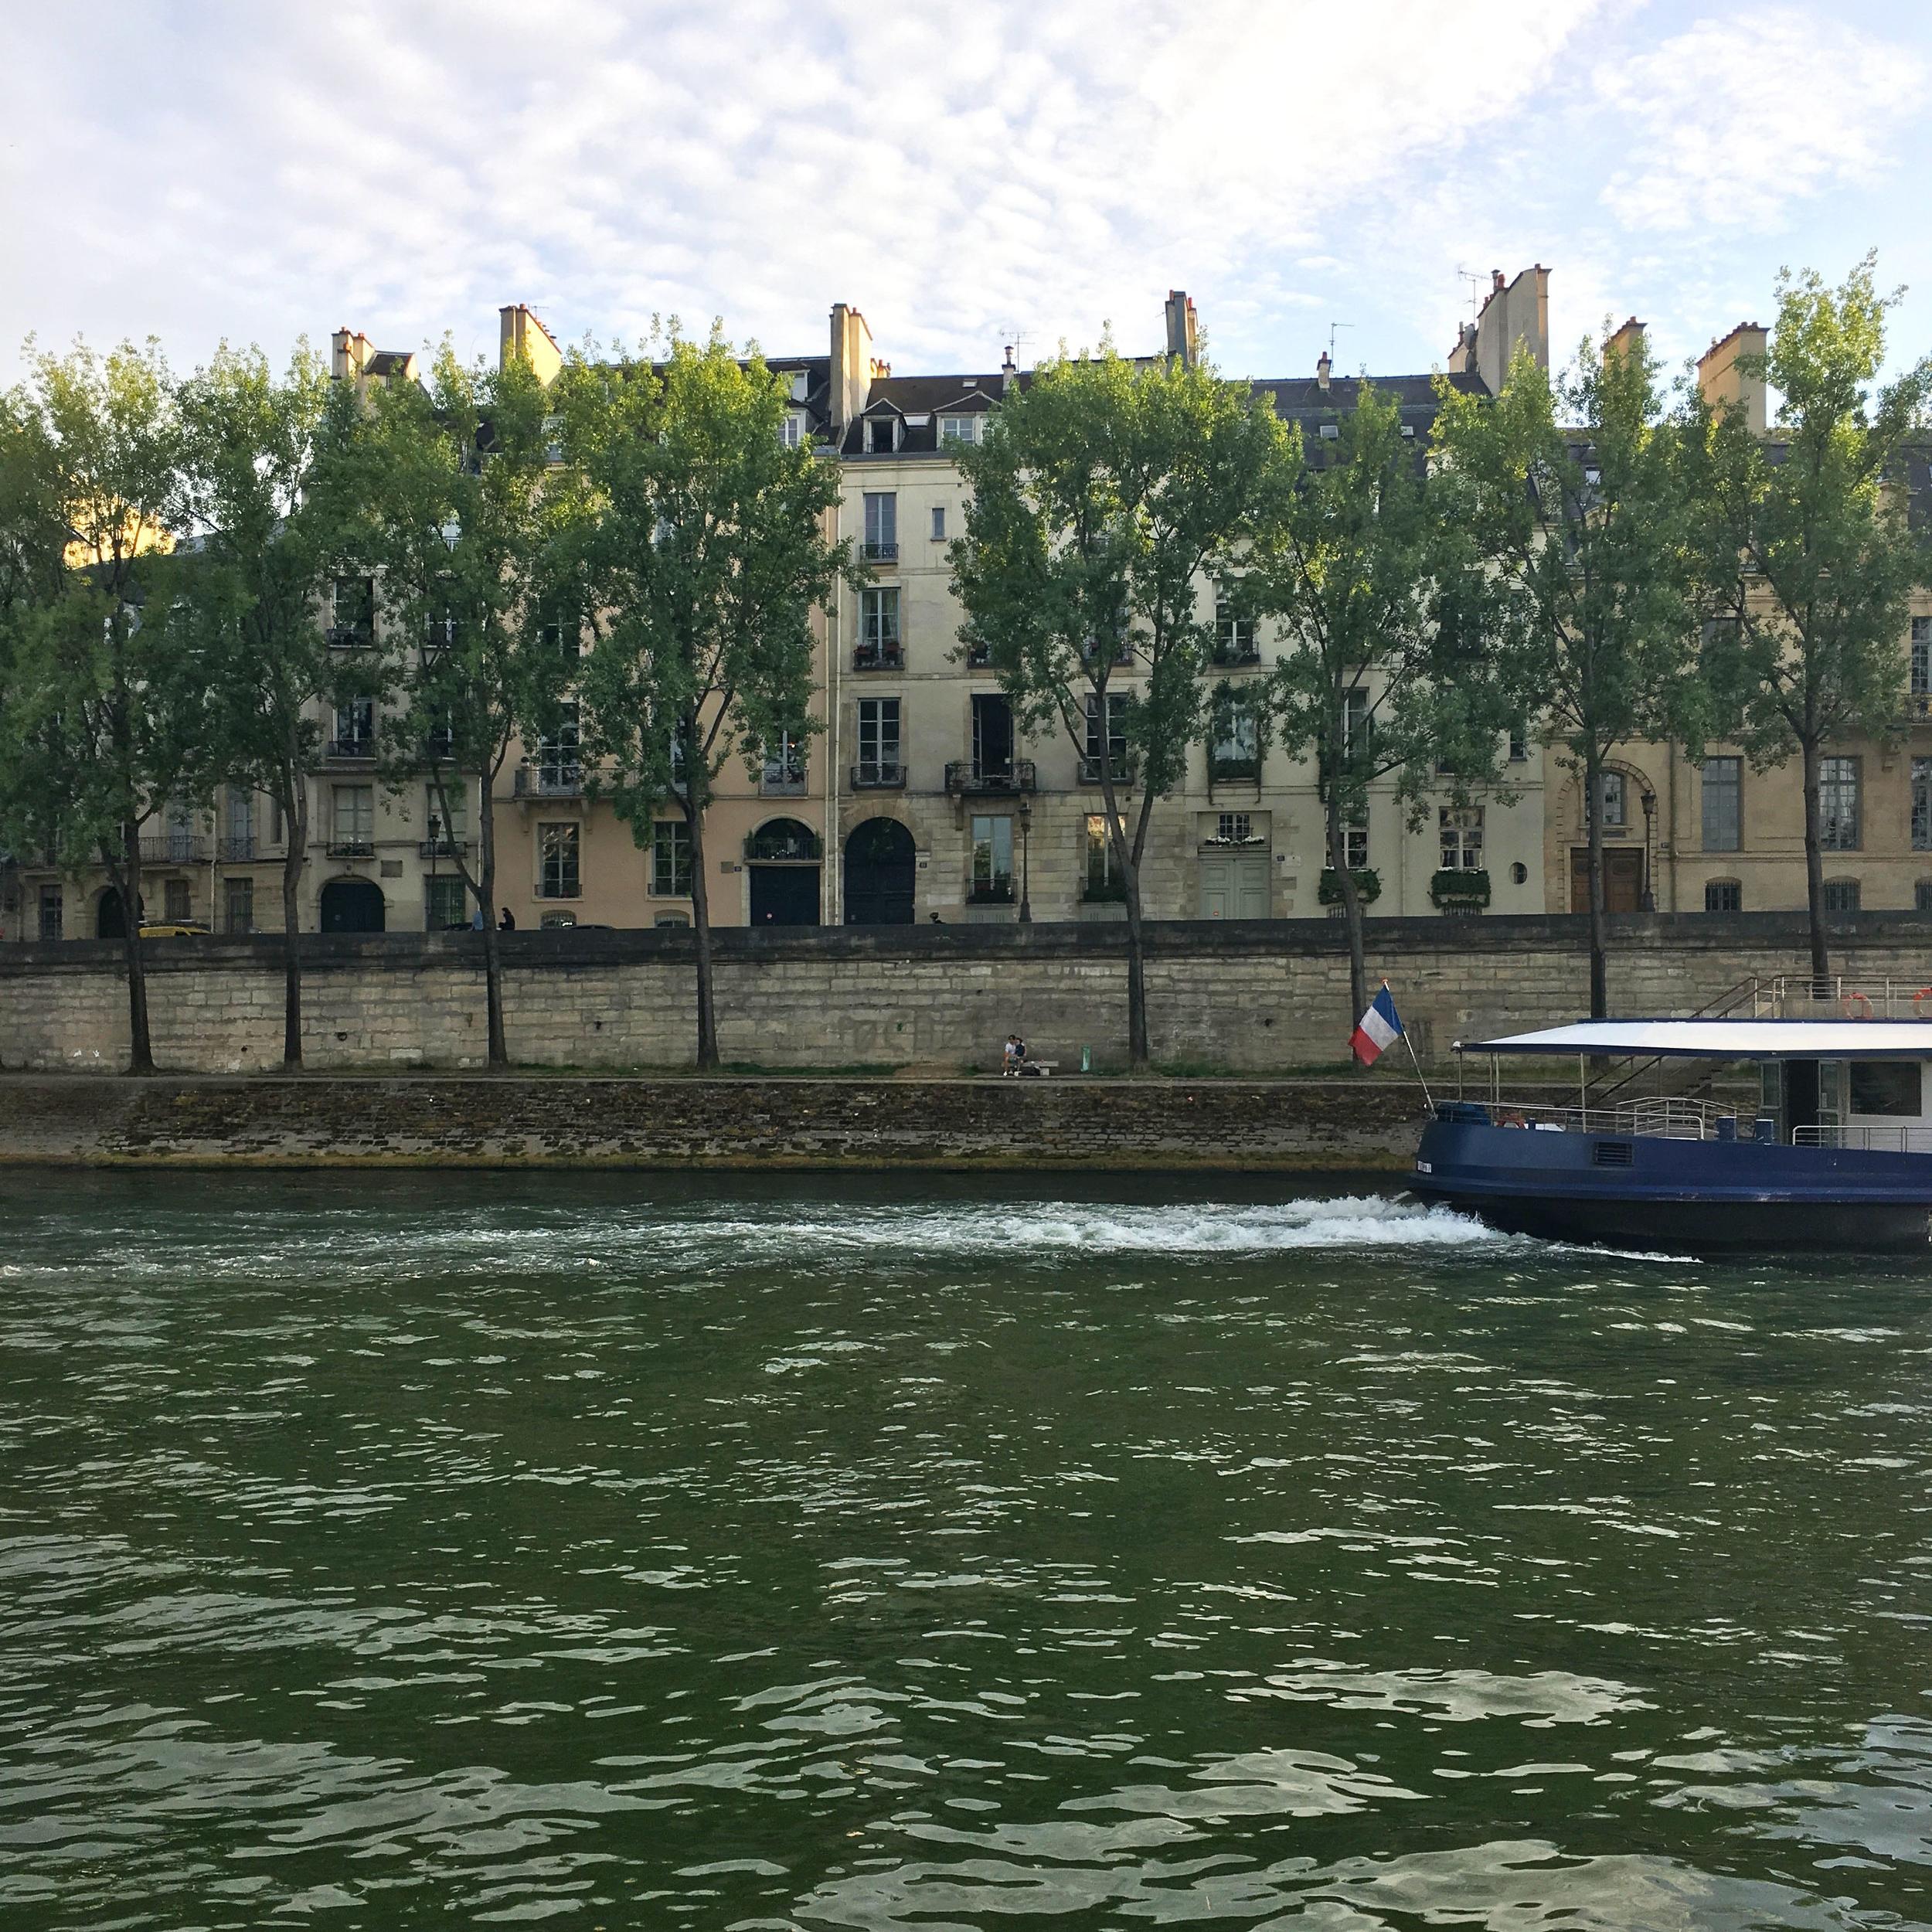 The river Seine wraps around Île Saint-Louis.